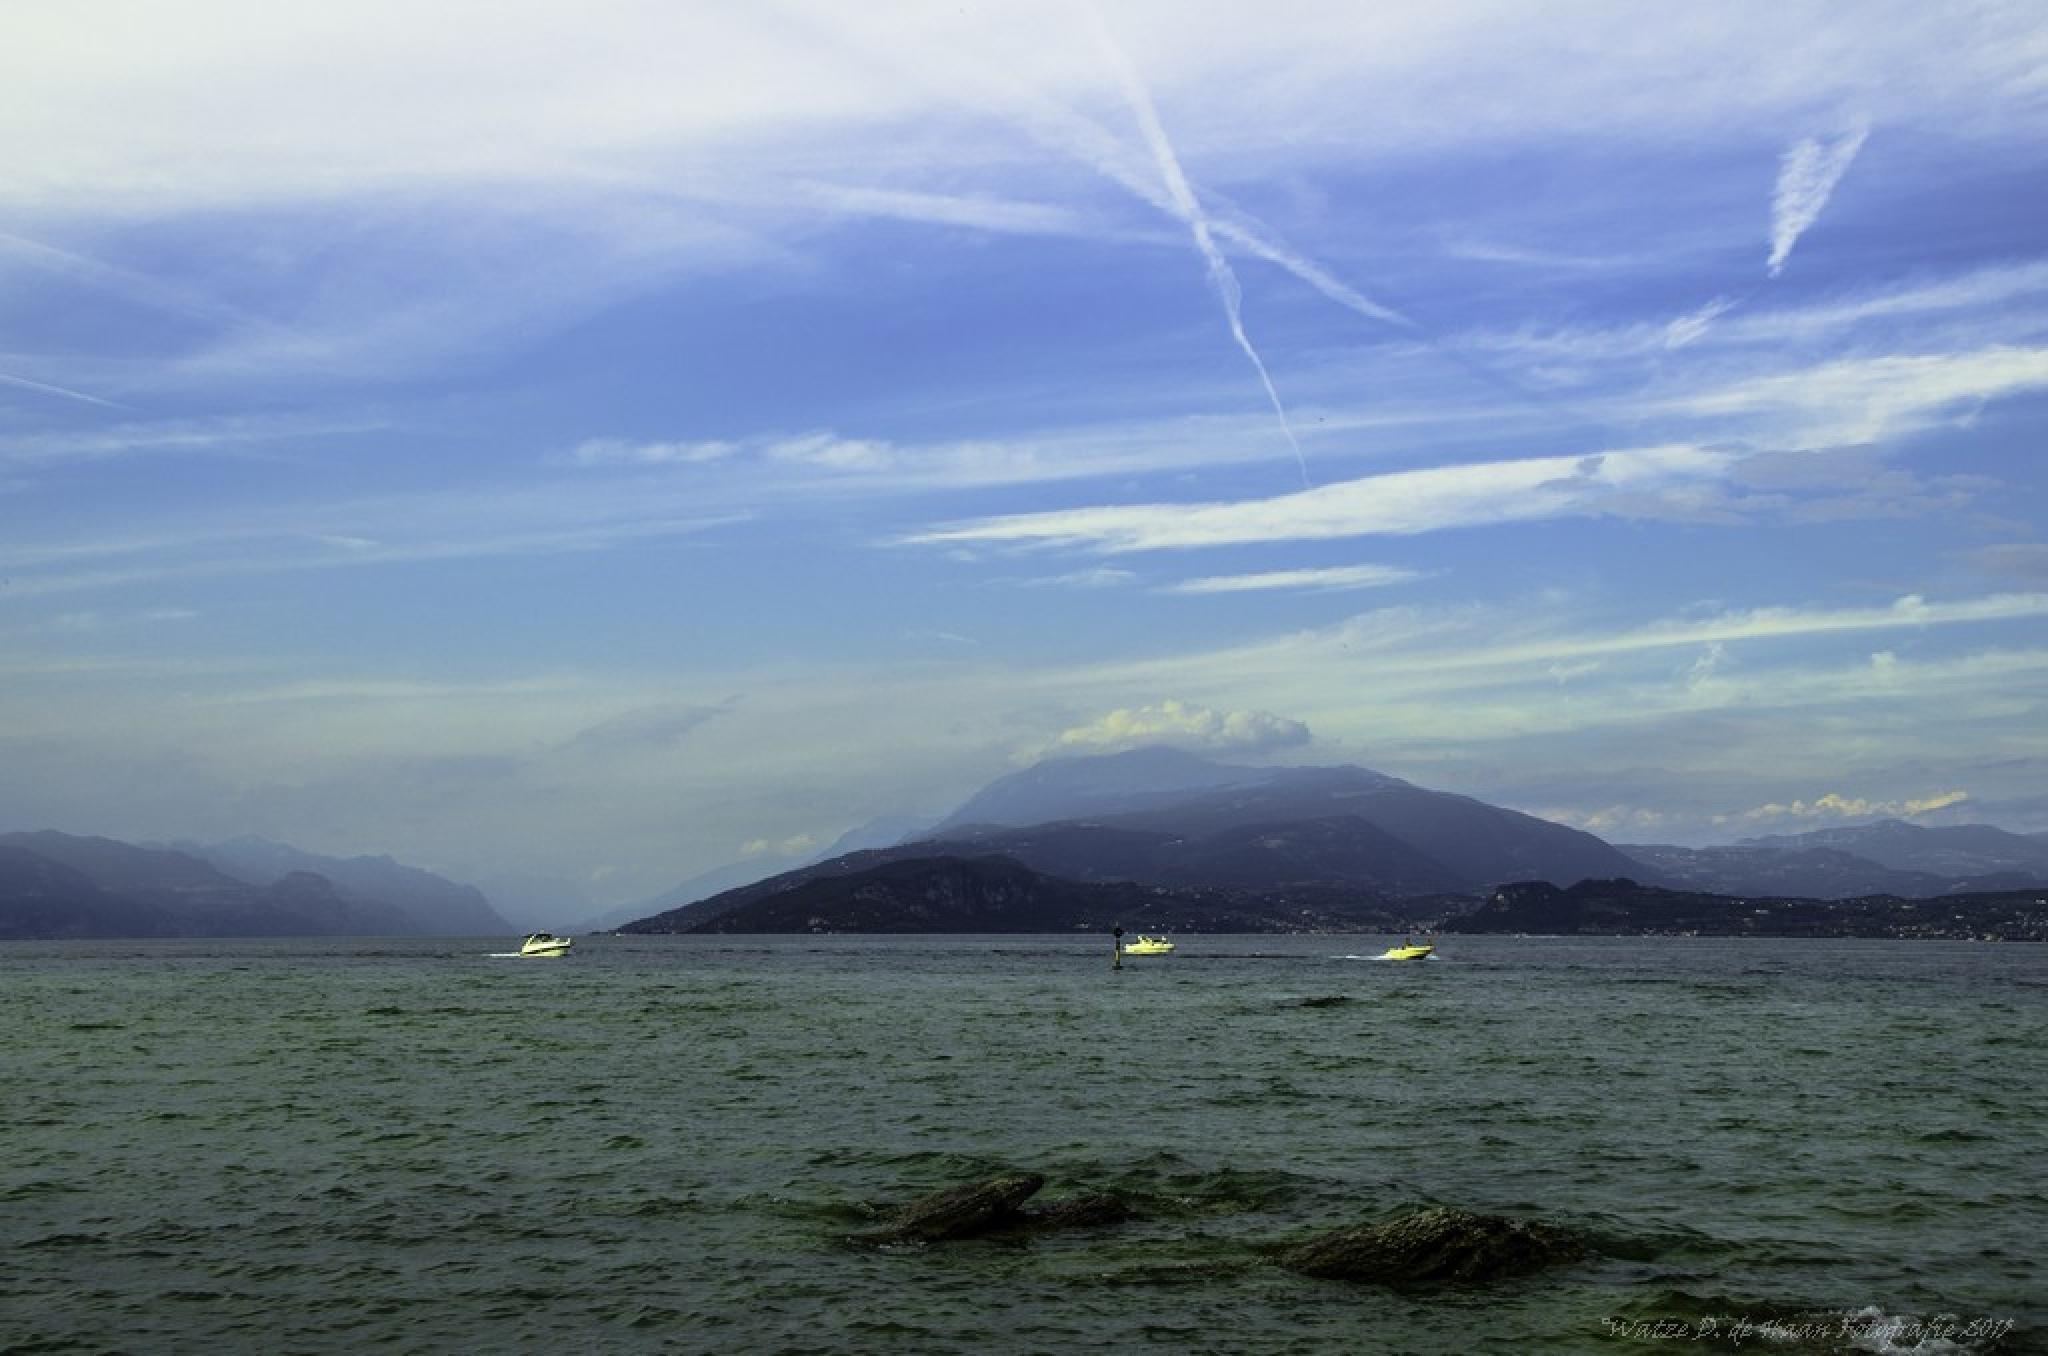 Lake Garda Italy  by Watze D. de Haan